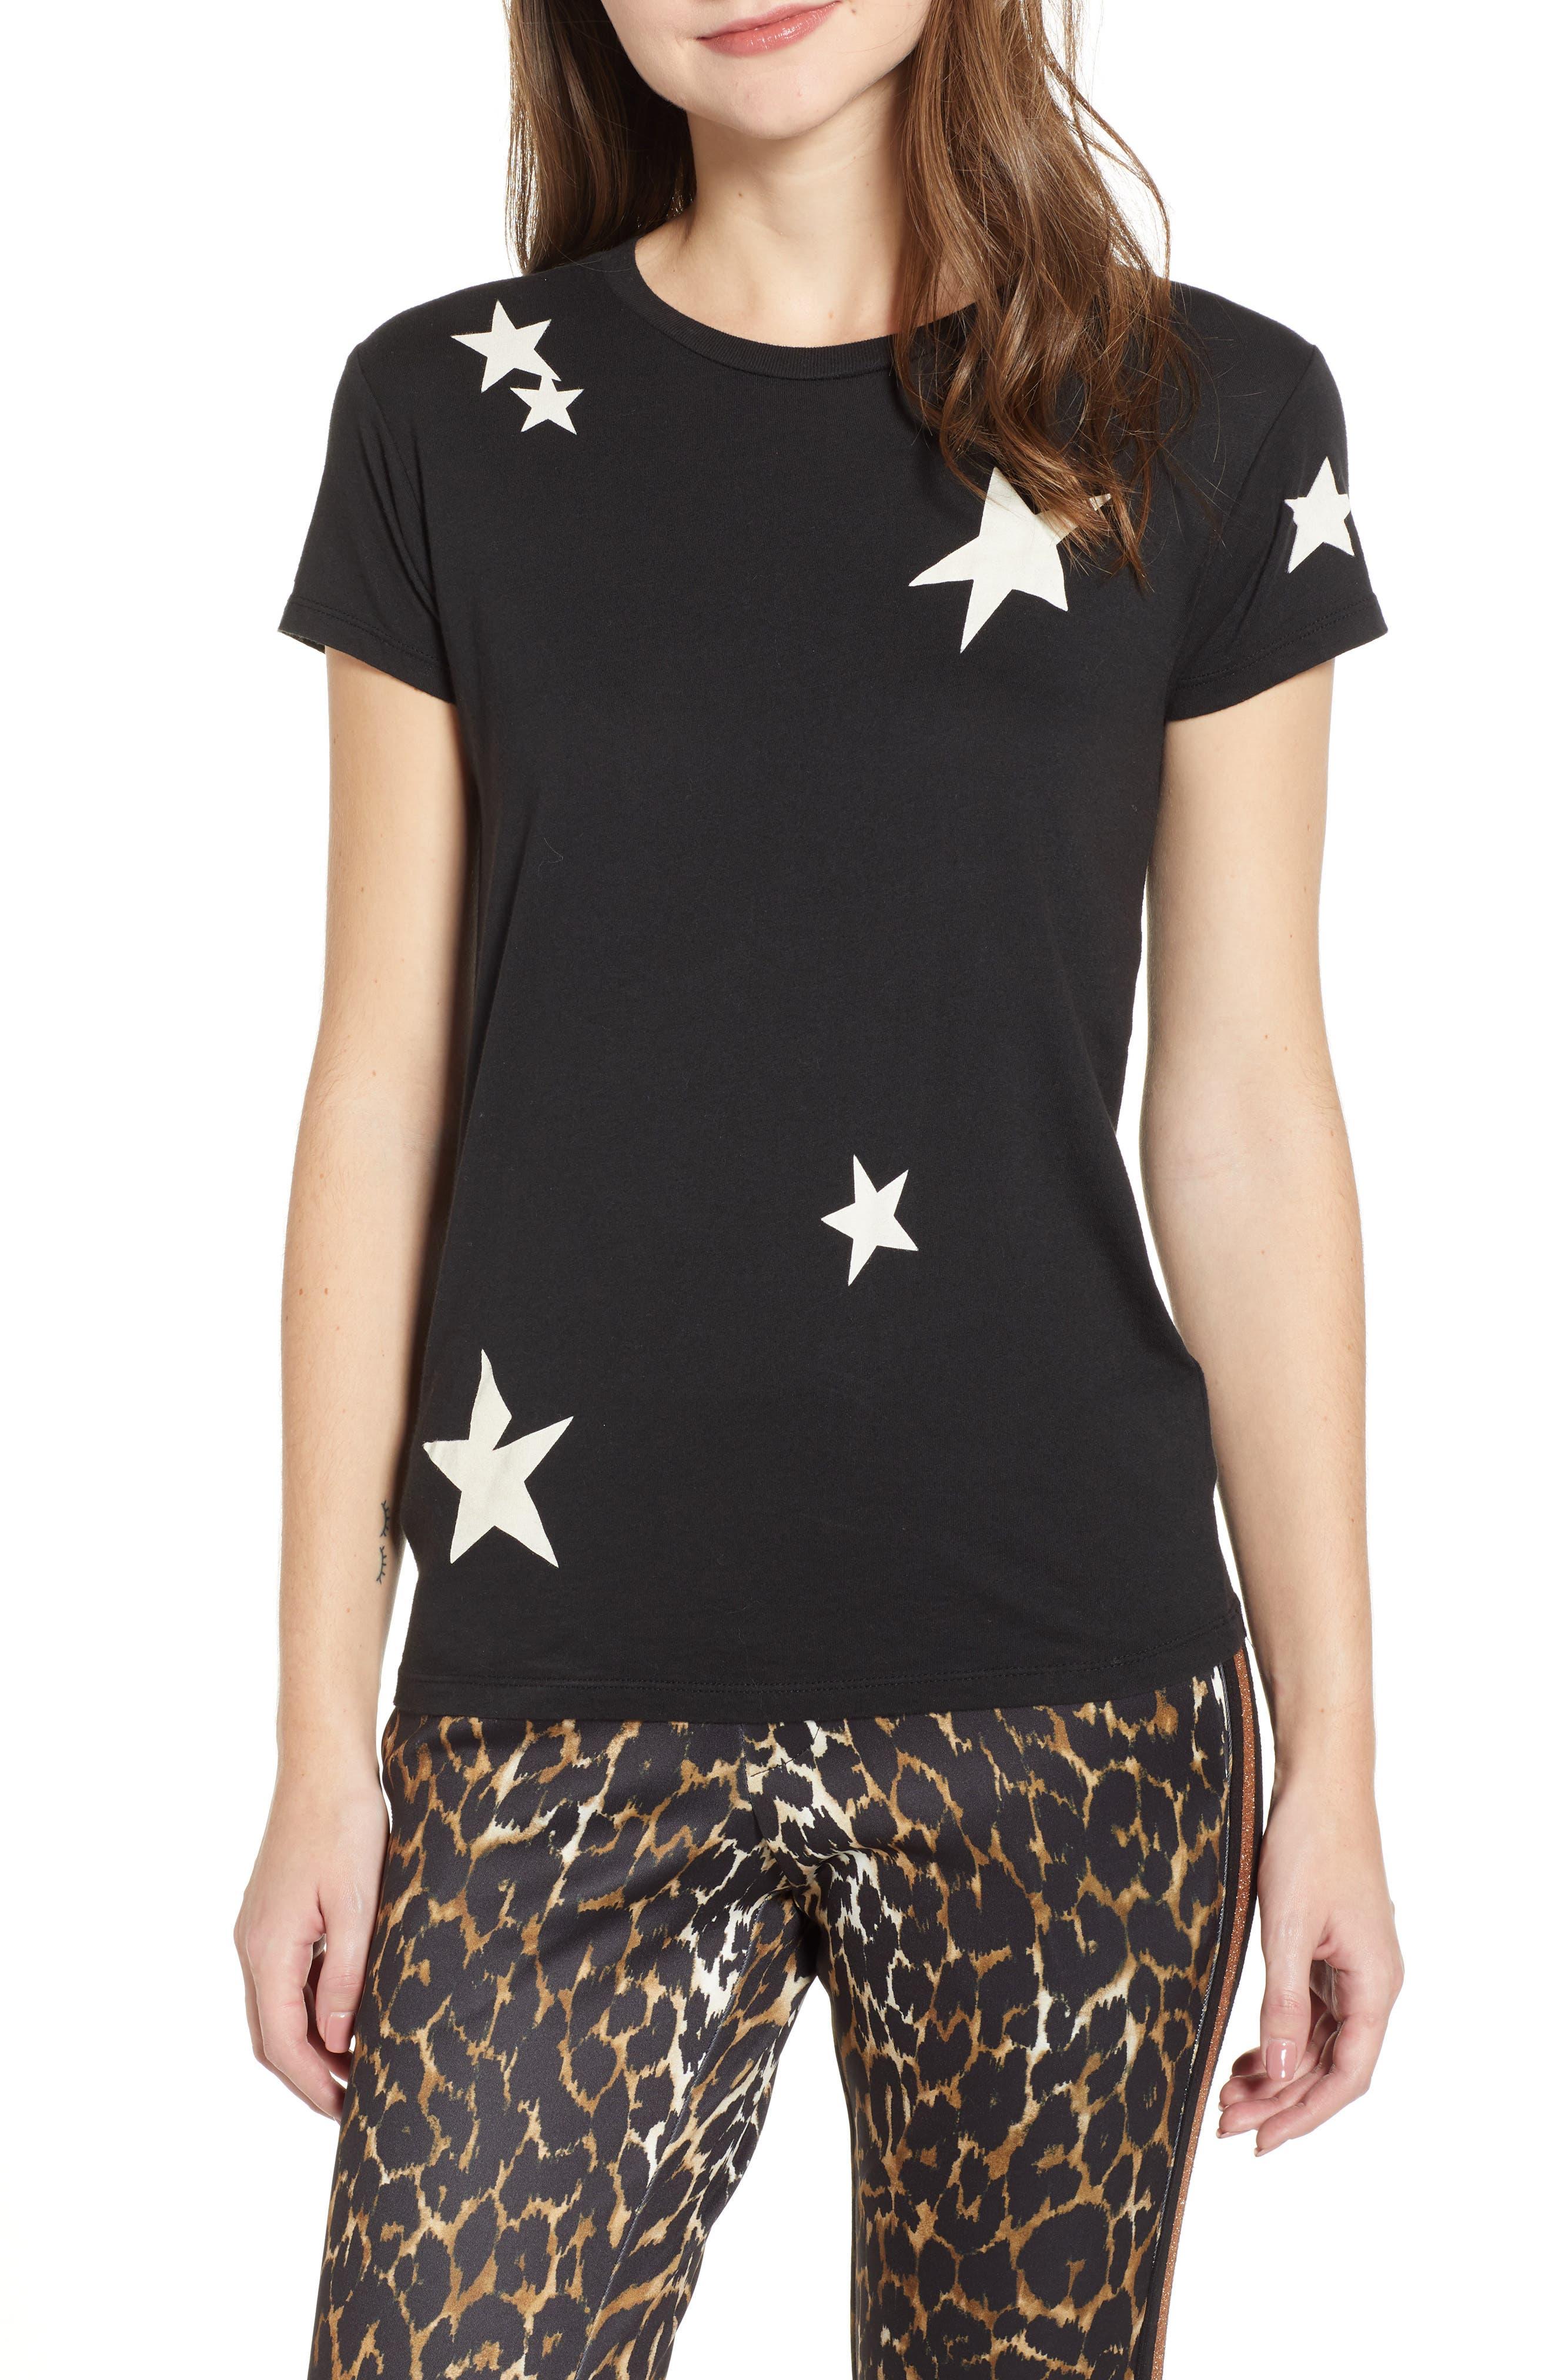 Pam & Gela Stars Print Tee, Size Petite - Black